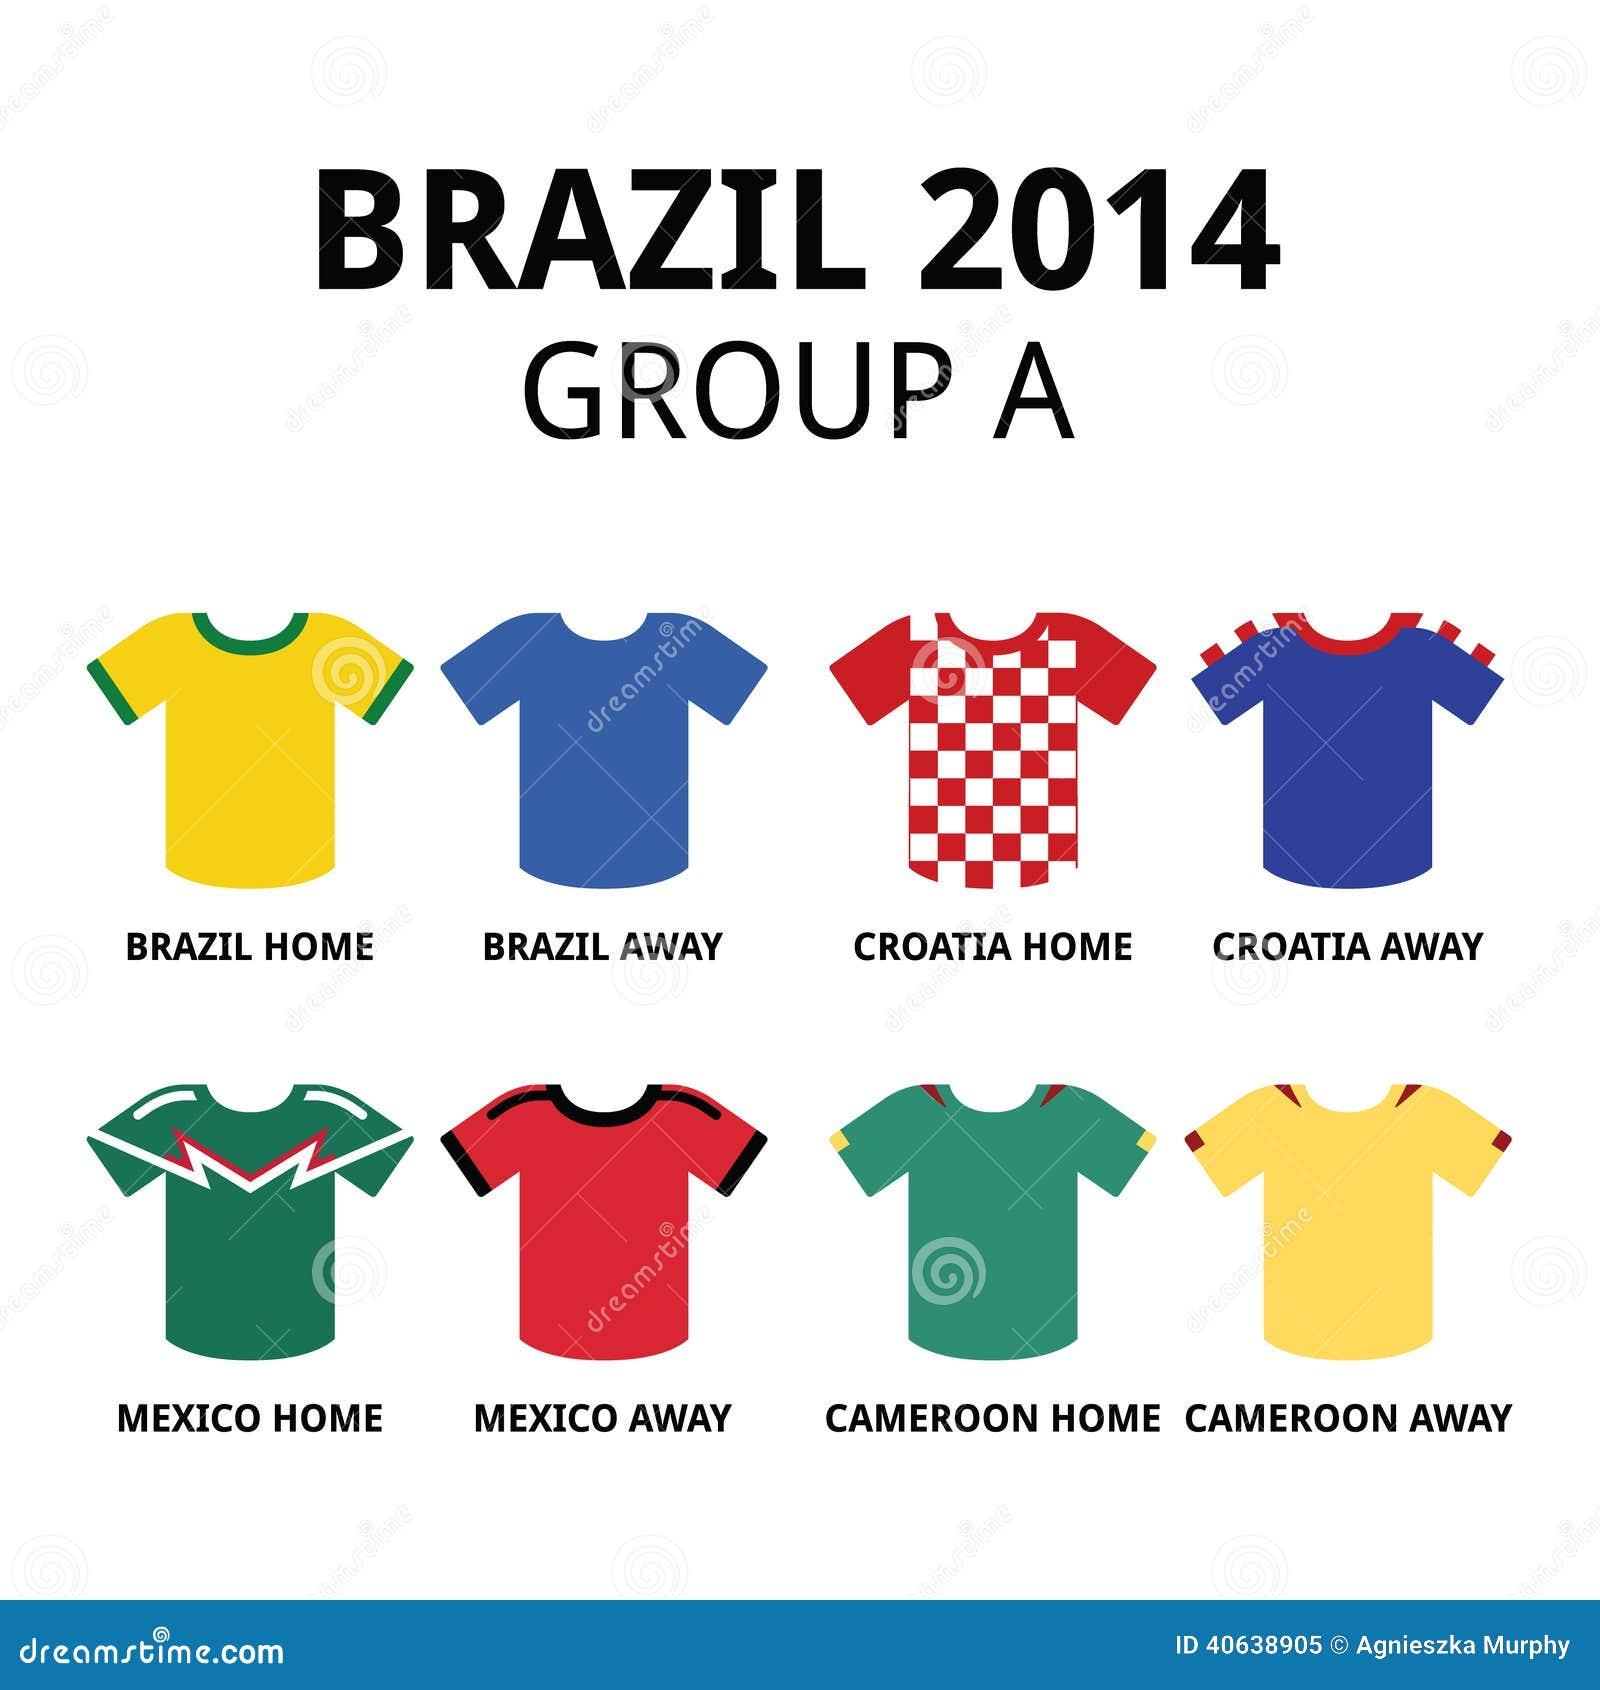 buy online 775e9 c79cd World Cup Brazil 2014 - Group A Teams Football Jerseys ...